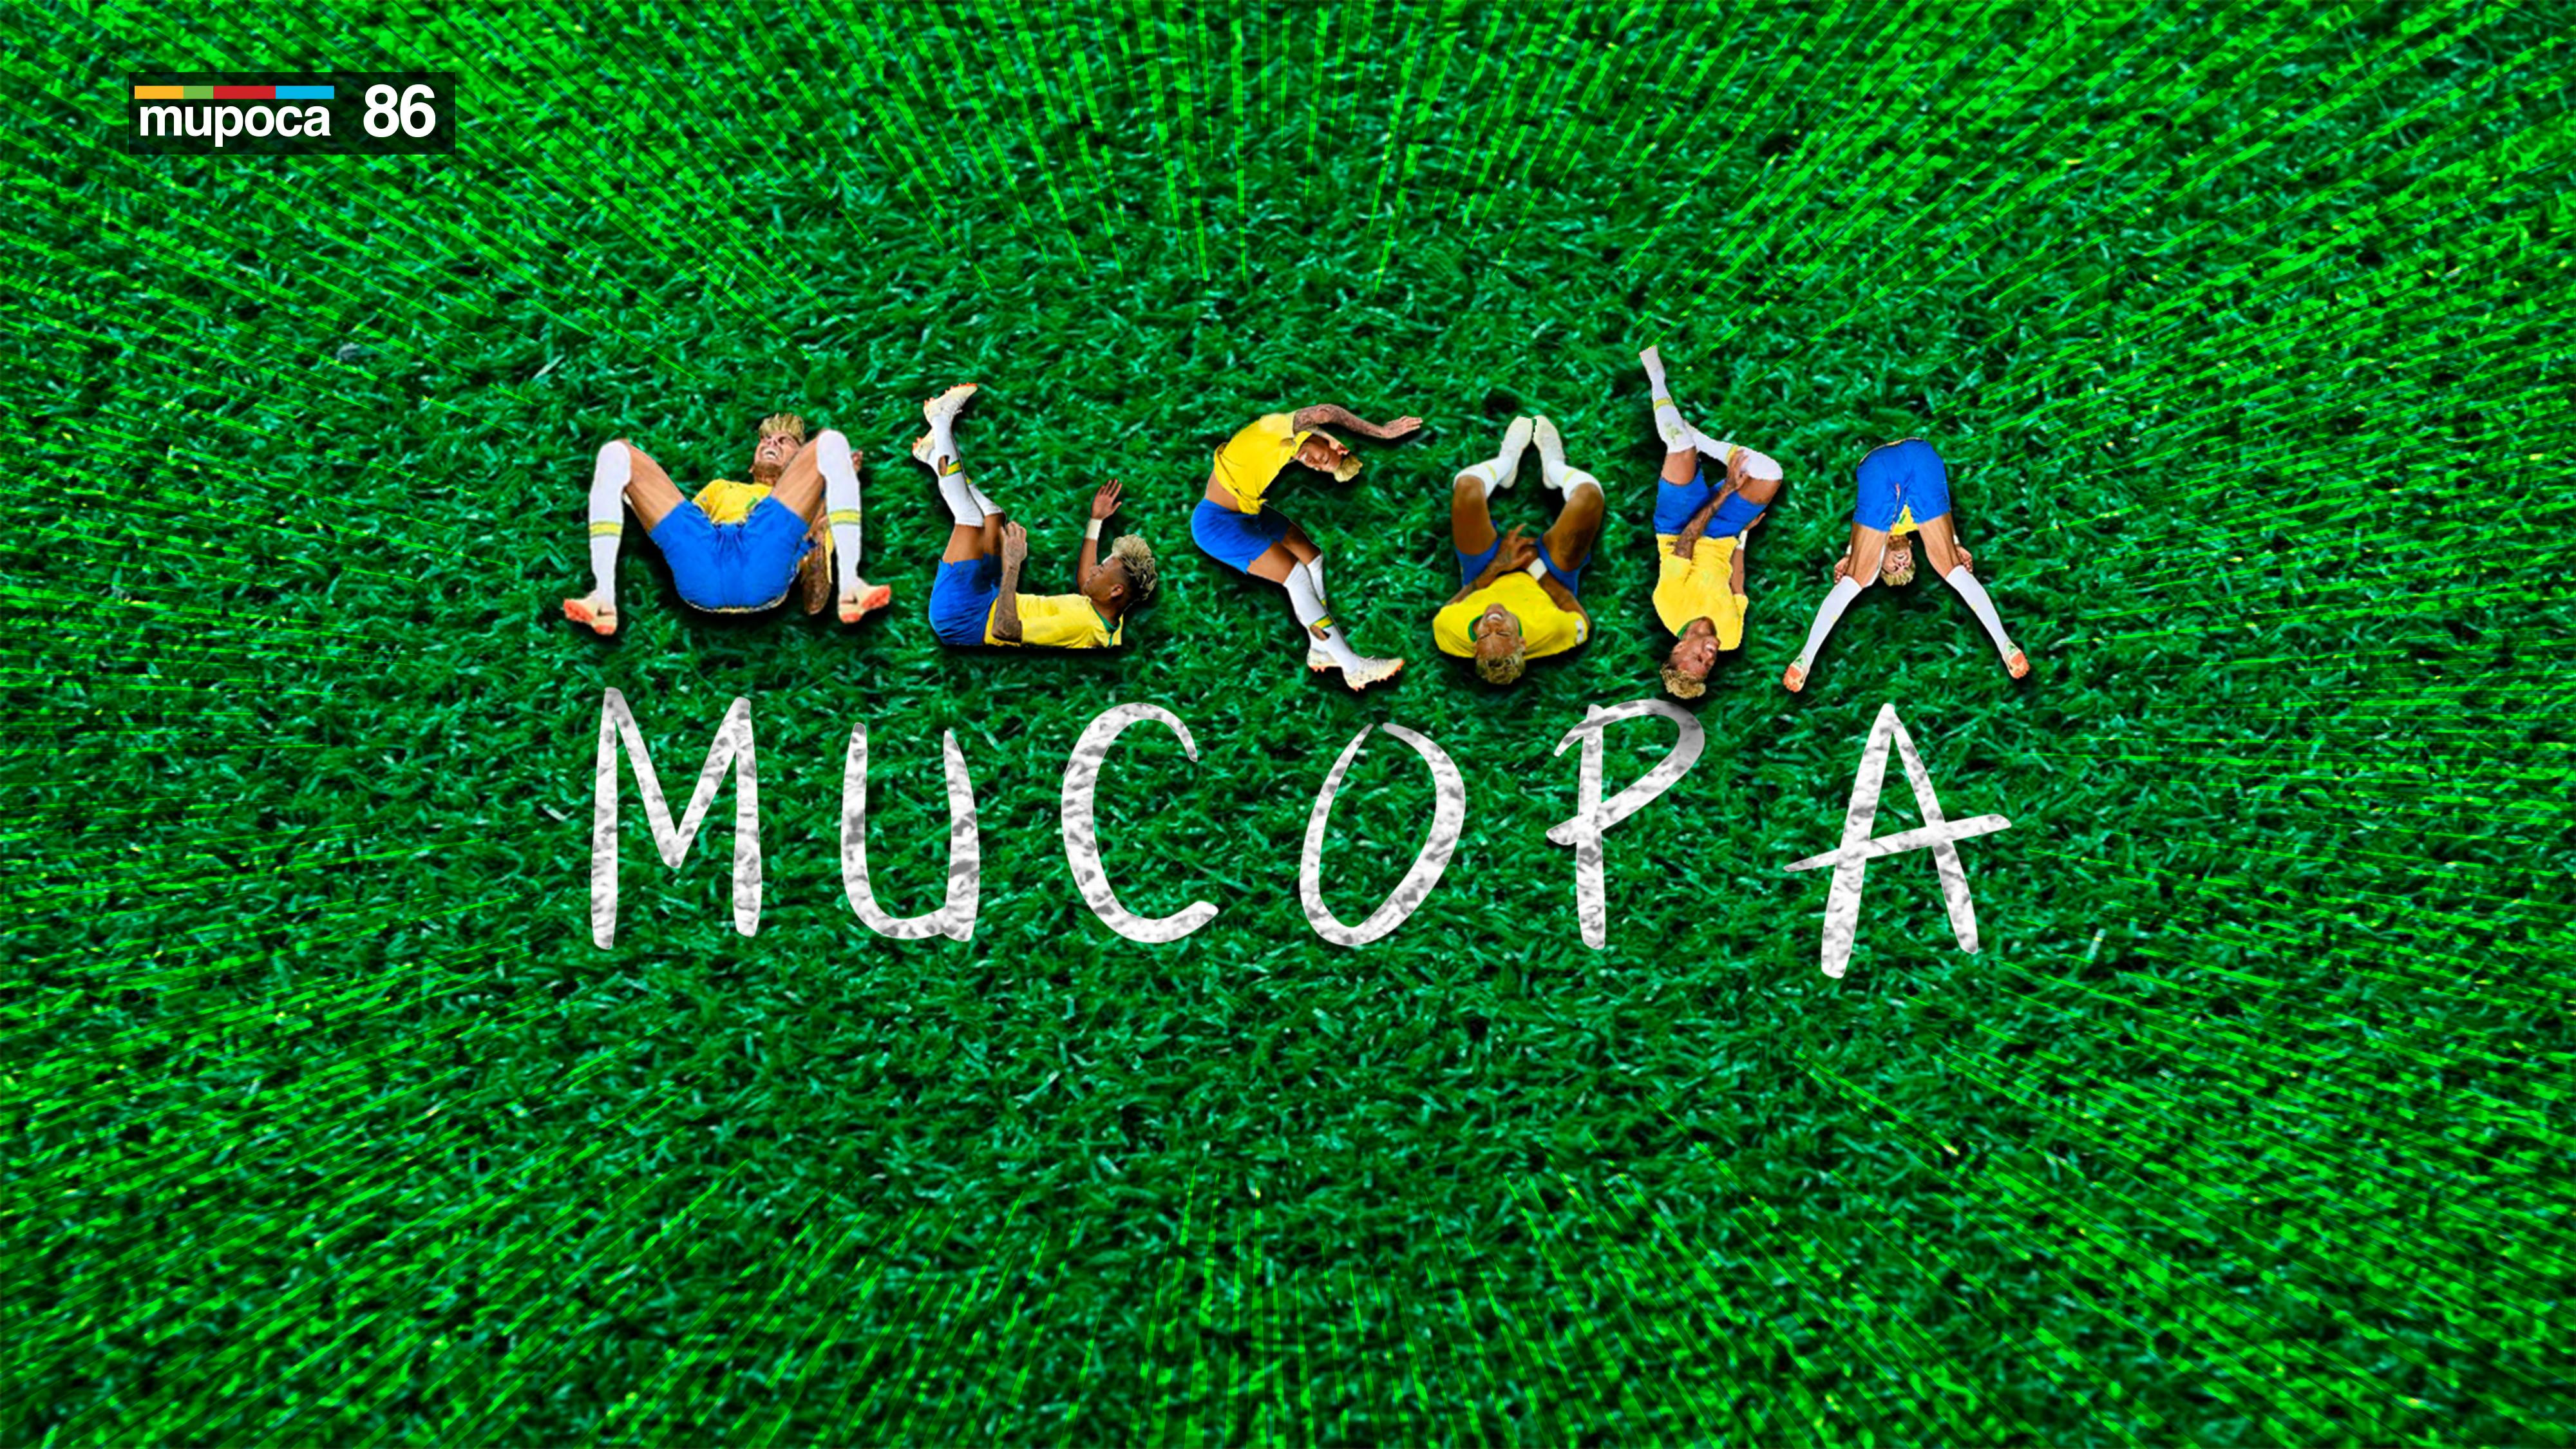 Mupoca 086 - MUCOPA, o programa sobre a Copa do Mundo